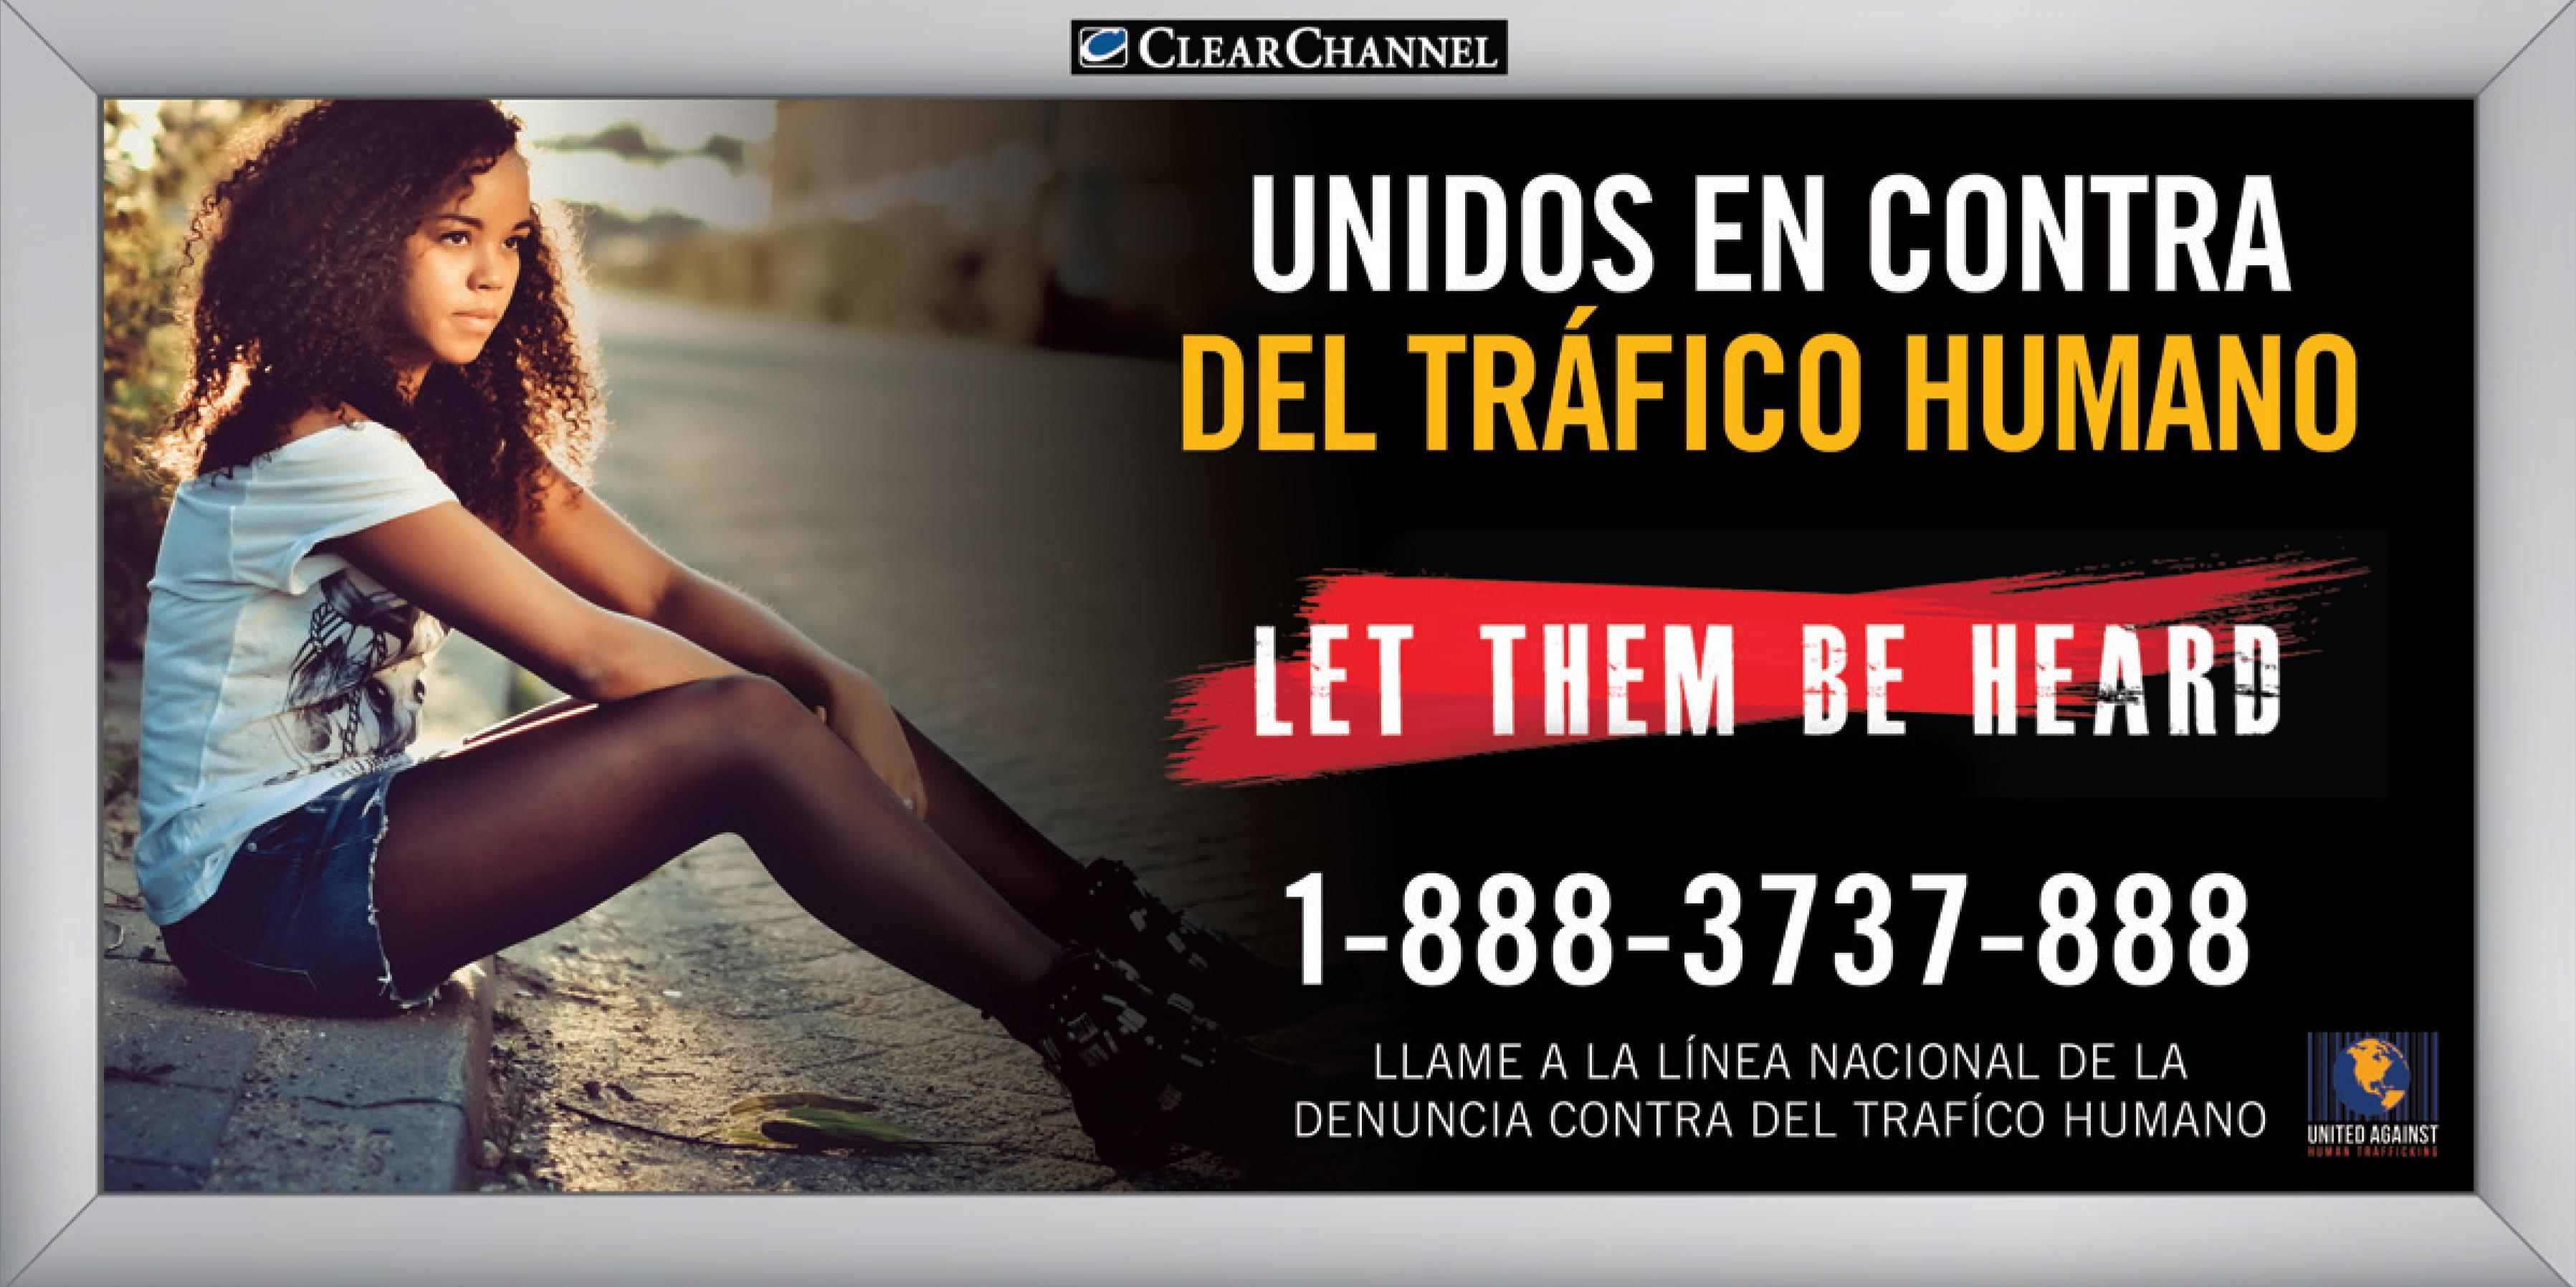 POKLUDA ARRESTED!: Texans Unite Against Human Trafficking: Local ...